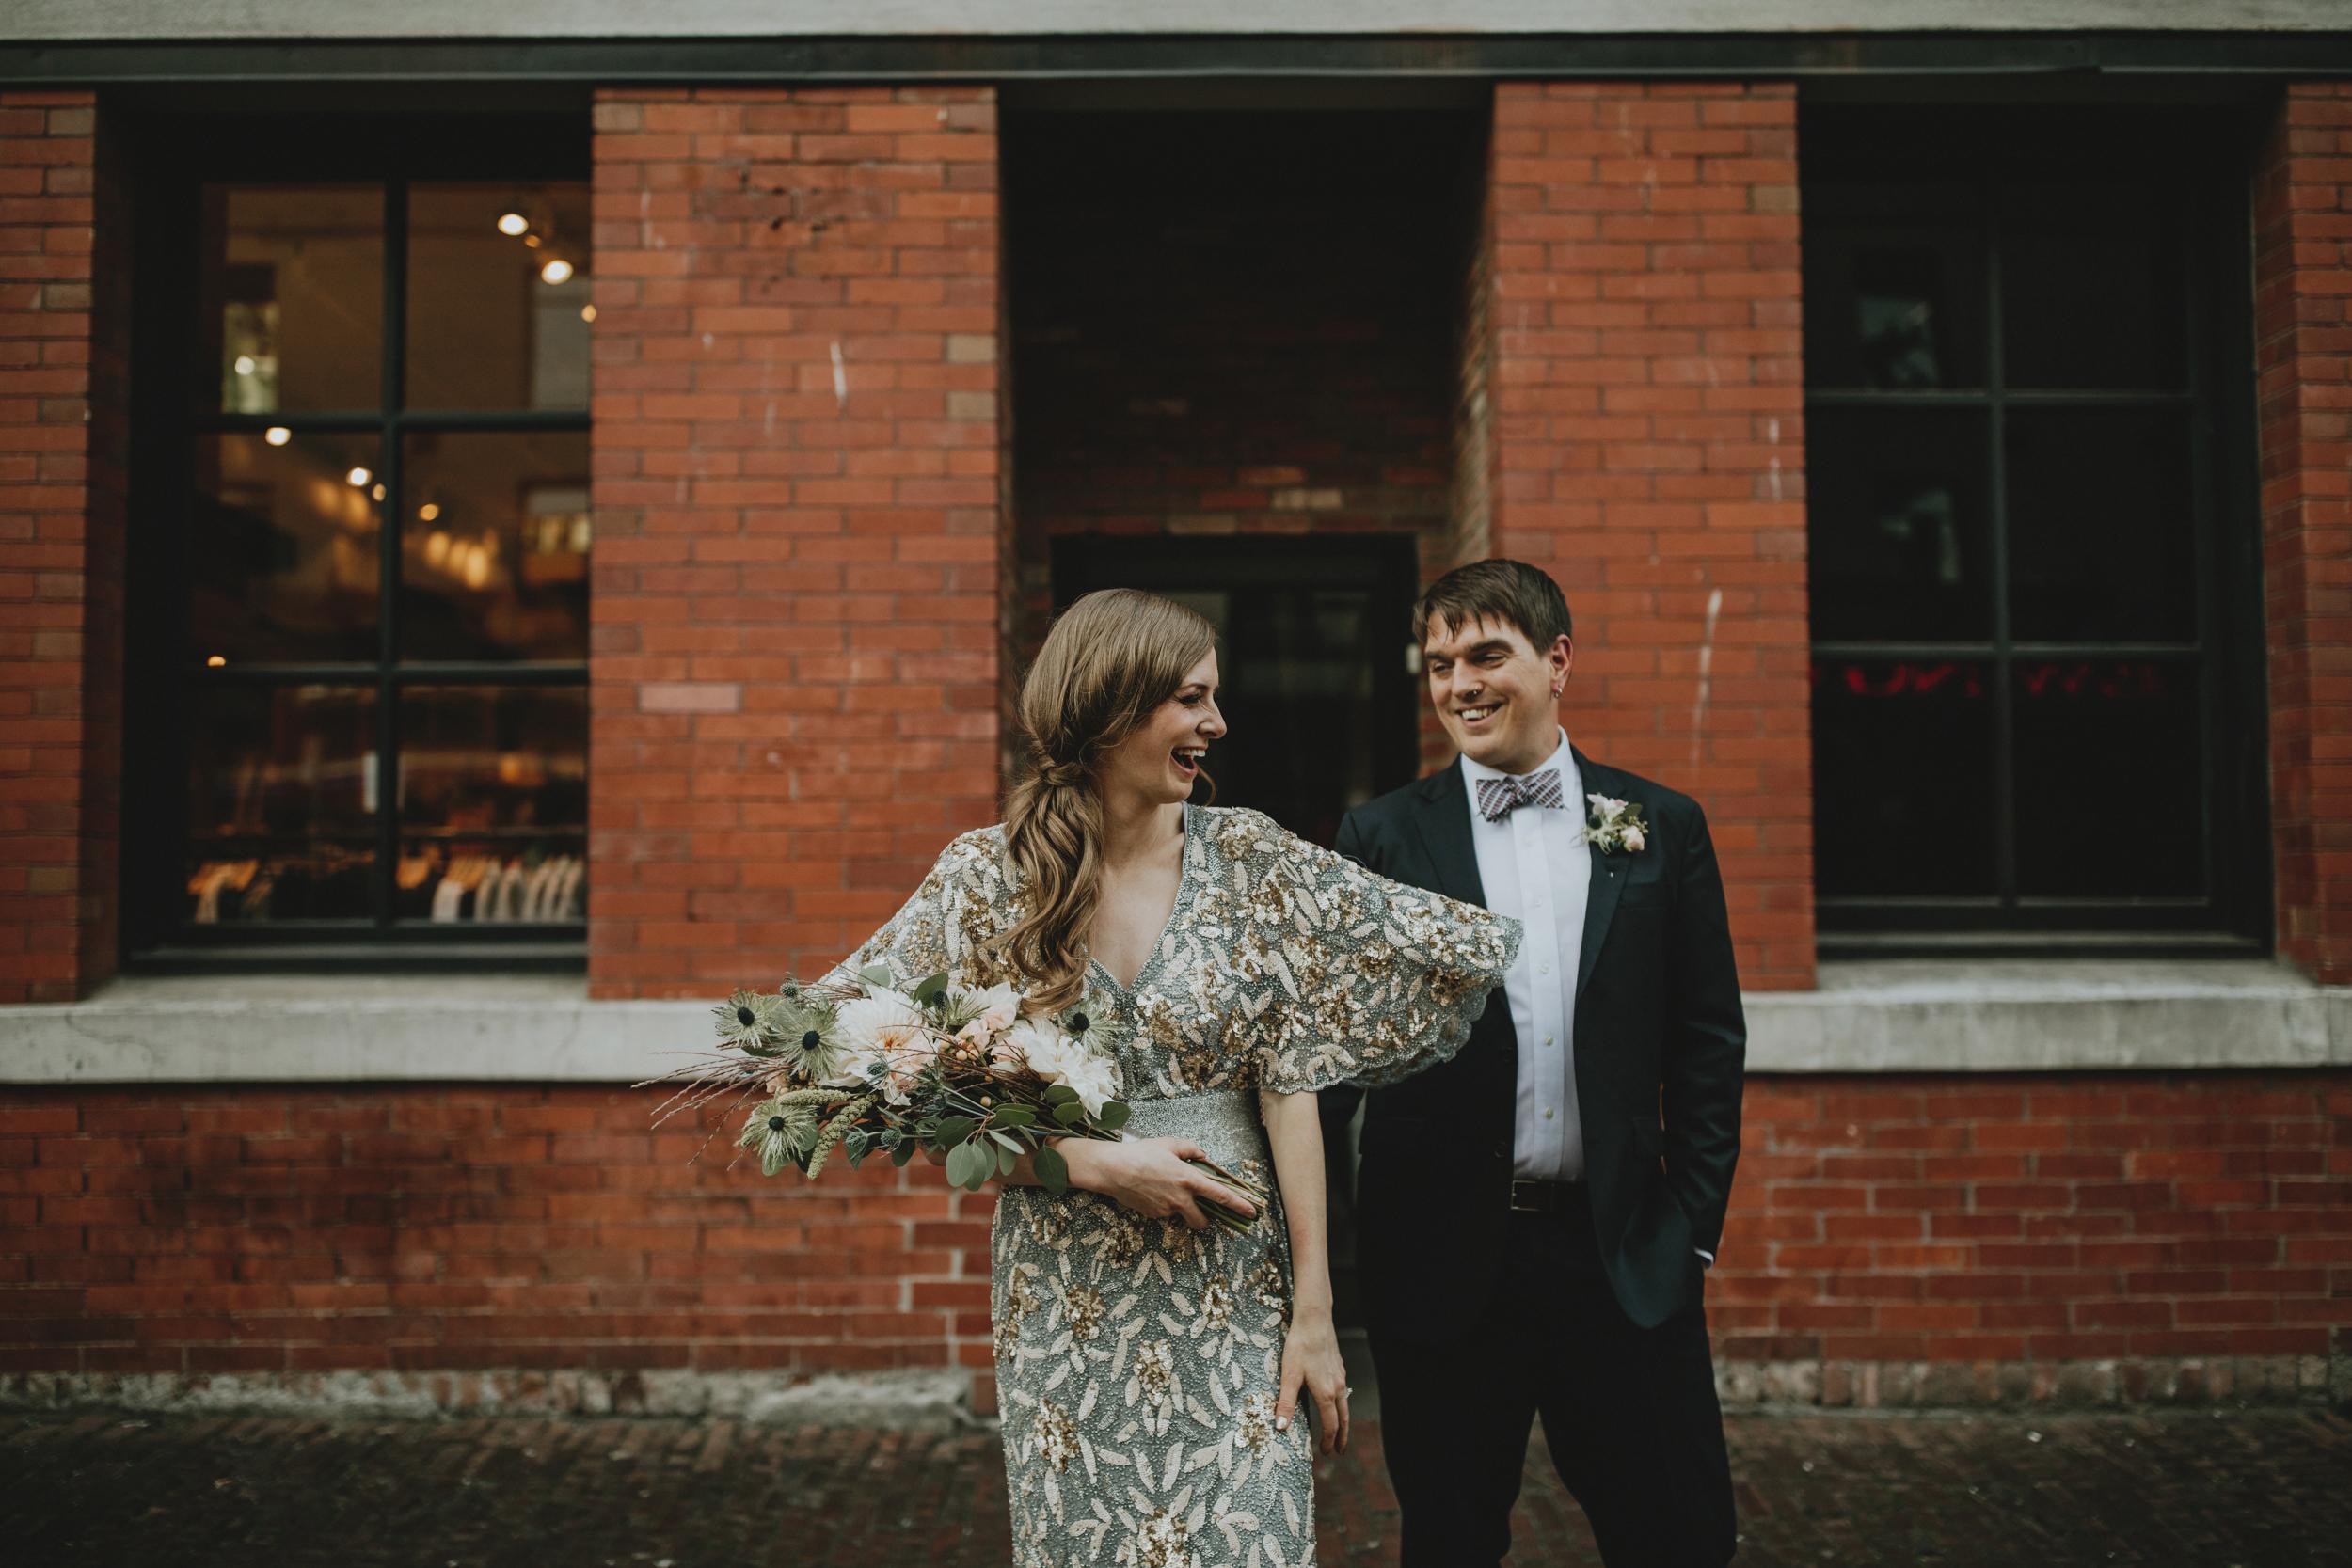 Earls-Loft-City-Wedding-Vancouver-3.jpg